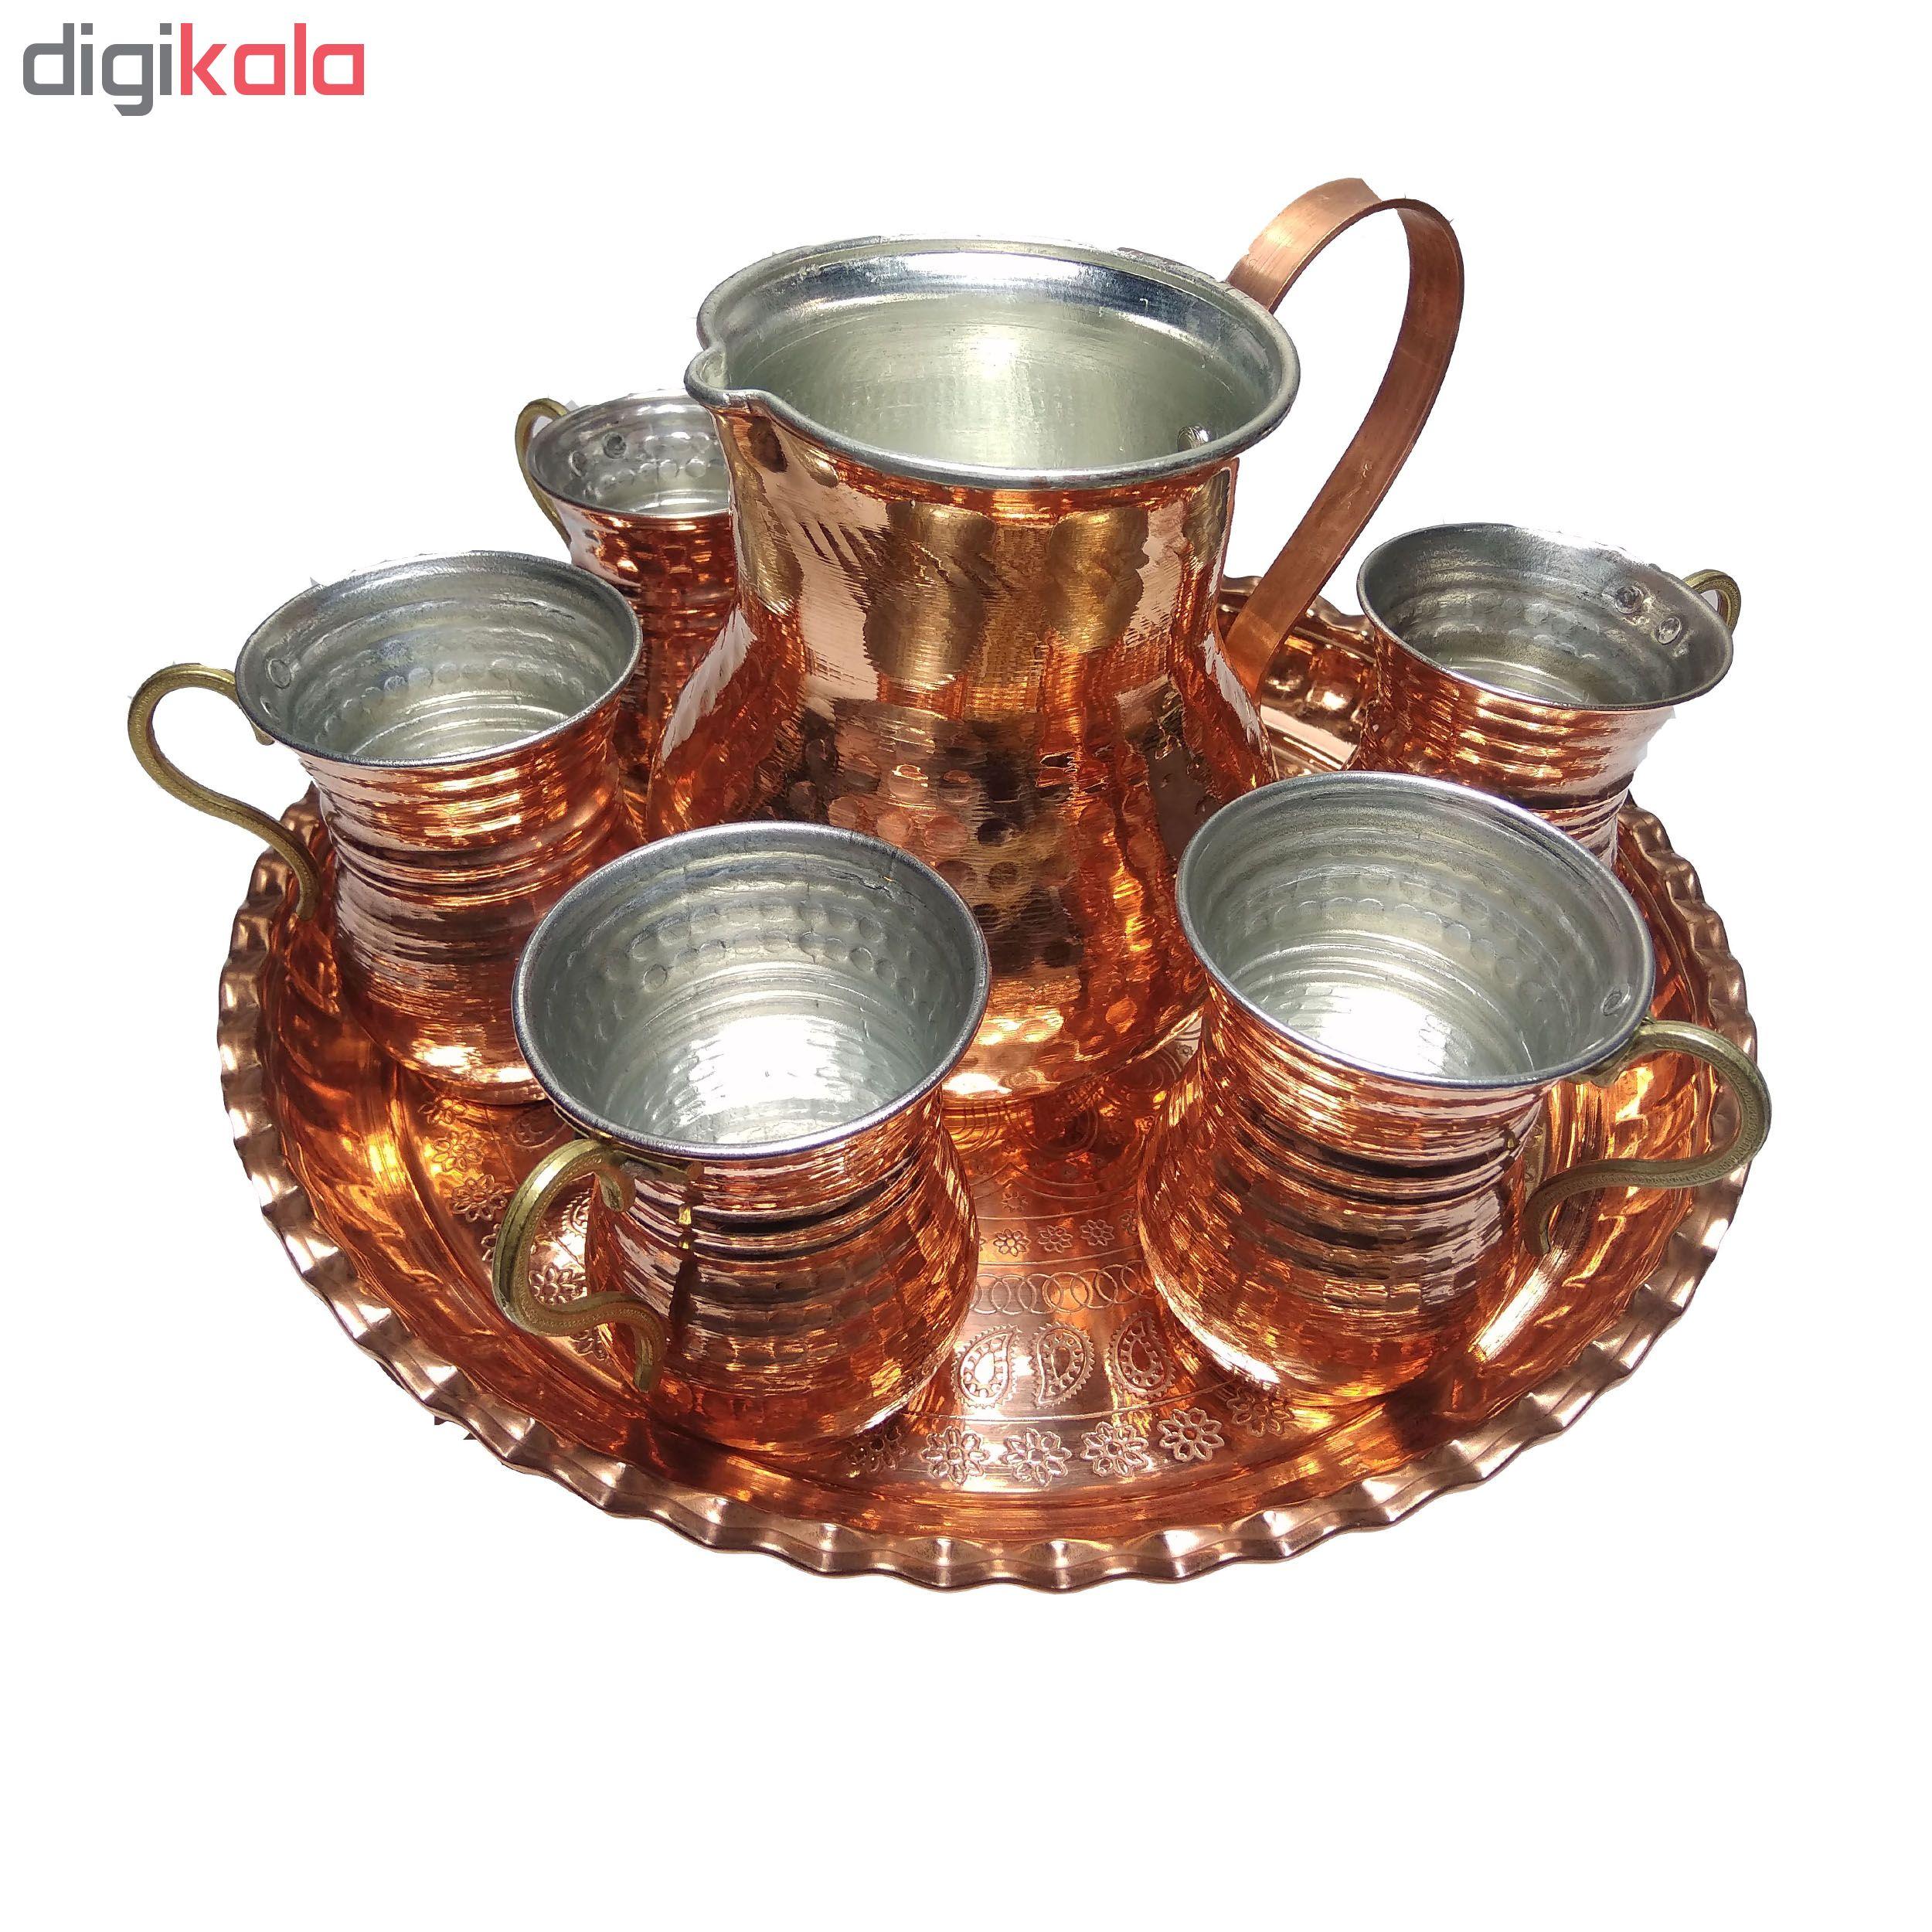 copper jar and glasses, set of 8, code mk1